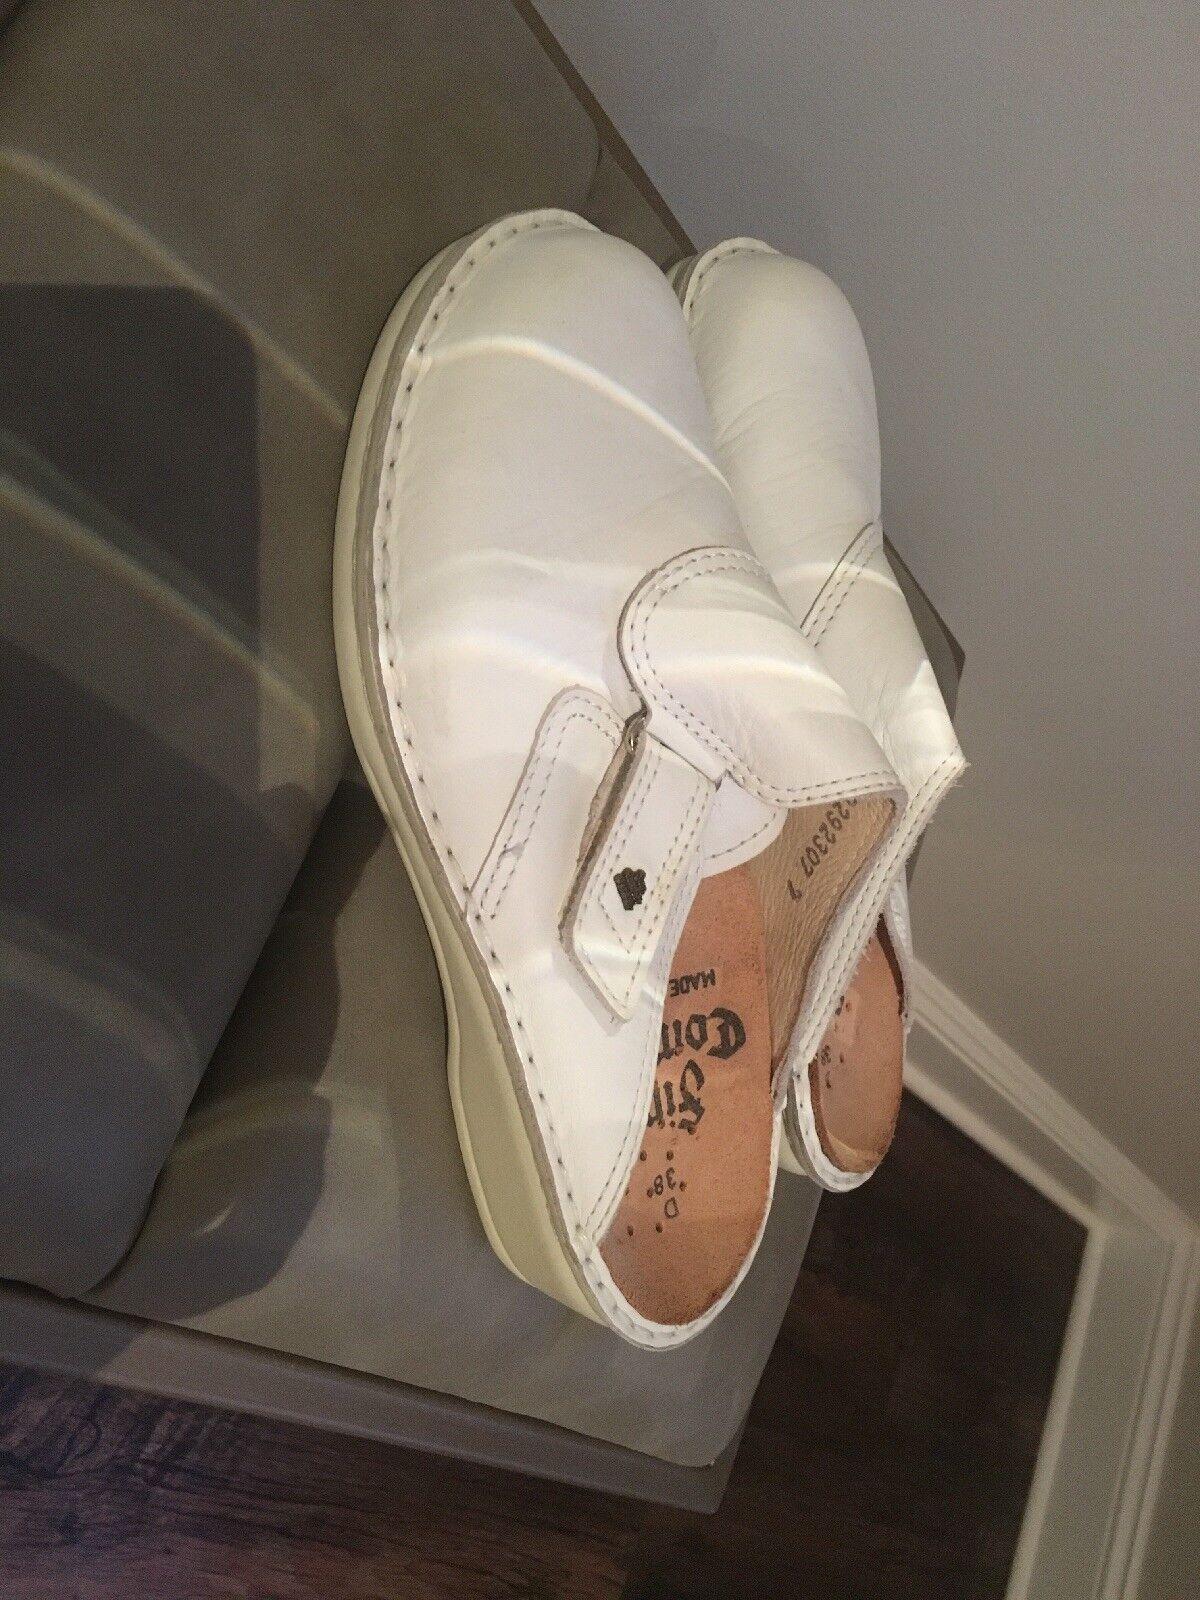 Finn Comfort Aussee WEISS Leder Slip On Mule/clog Größe 38